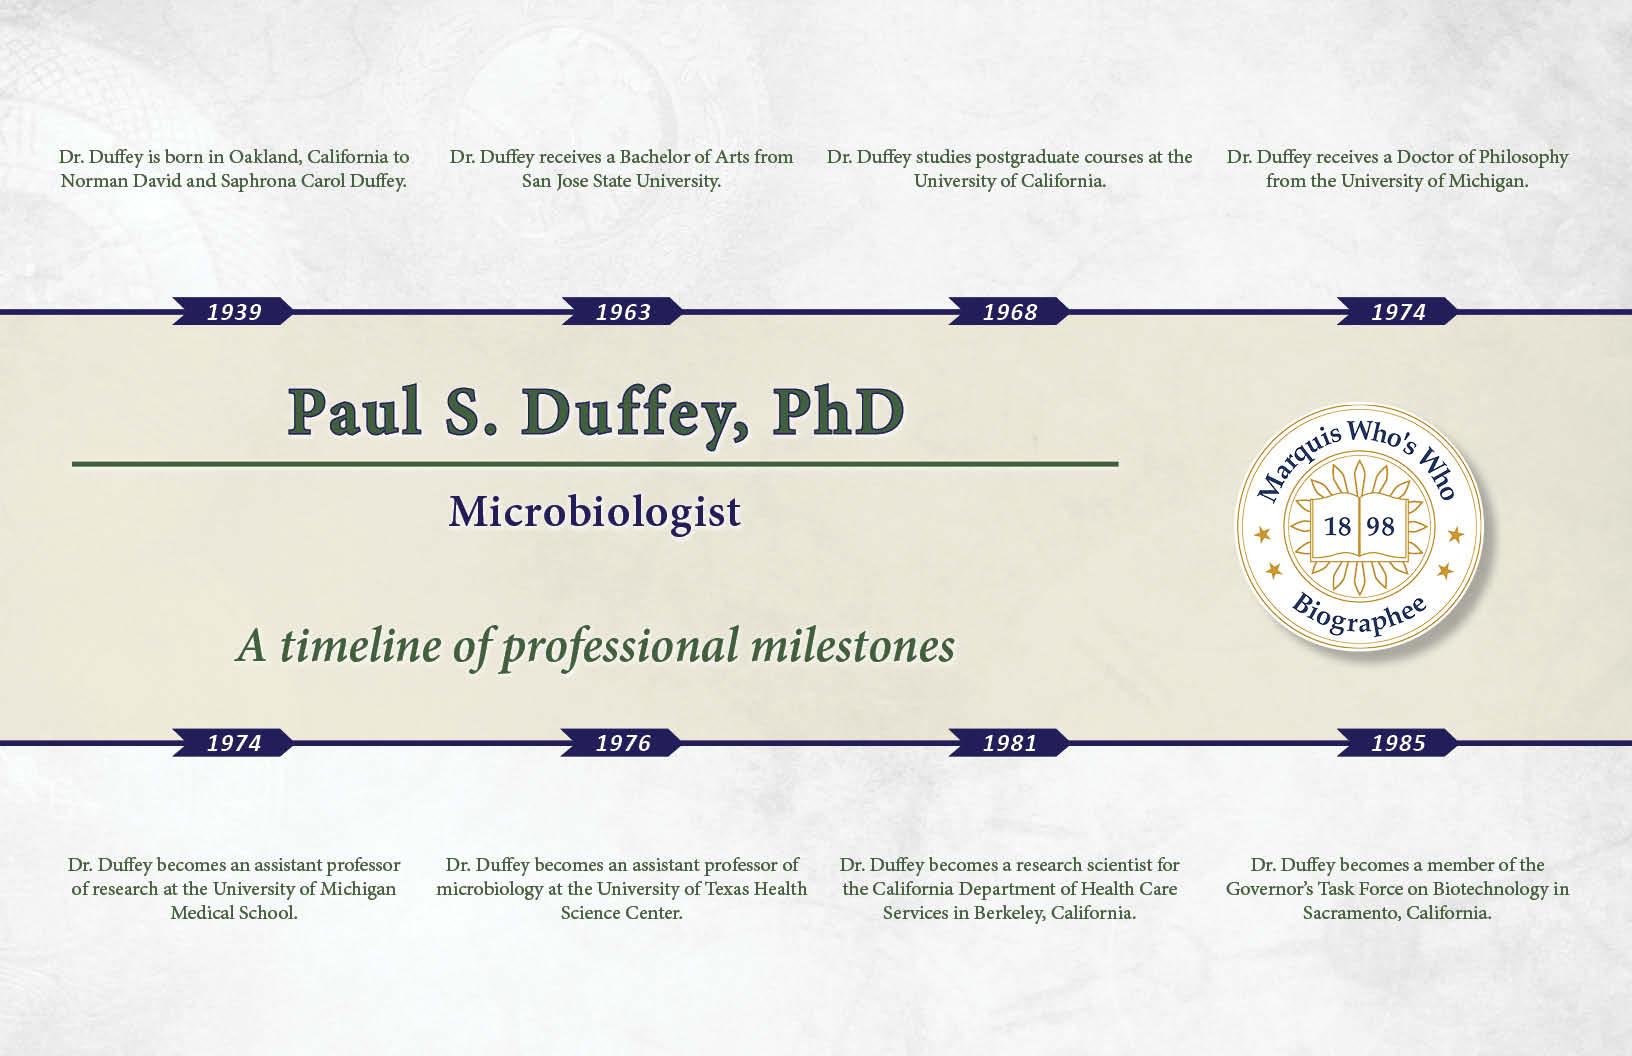 Paul Duffey Professional Milestones